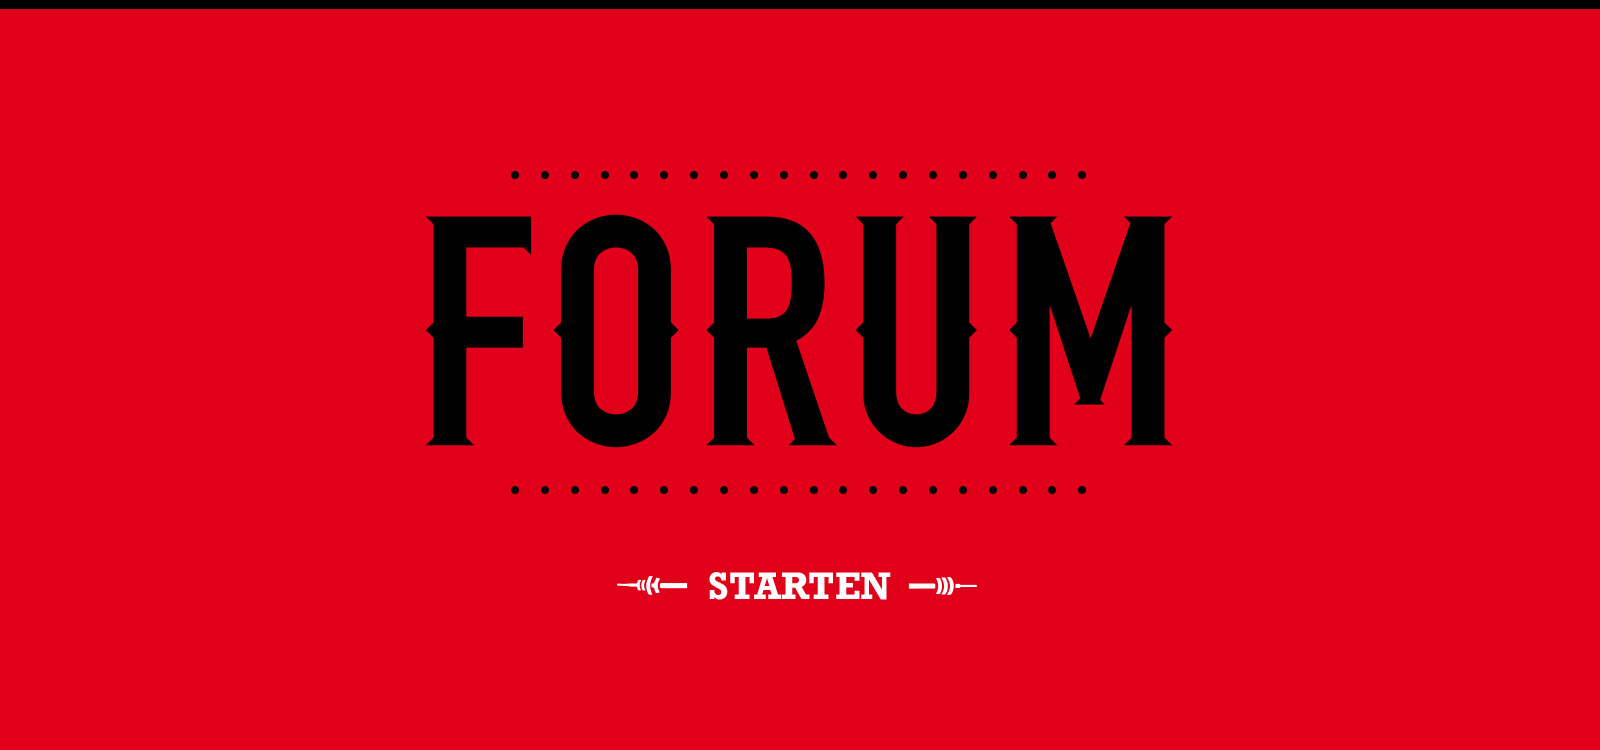 Forum des VfB Stuttgart Fanclubs Roter Brustring Hamburg